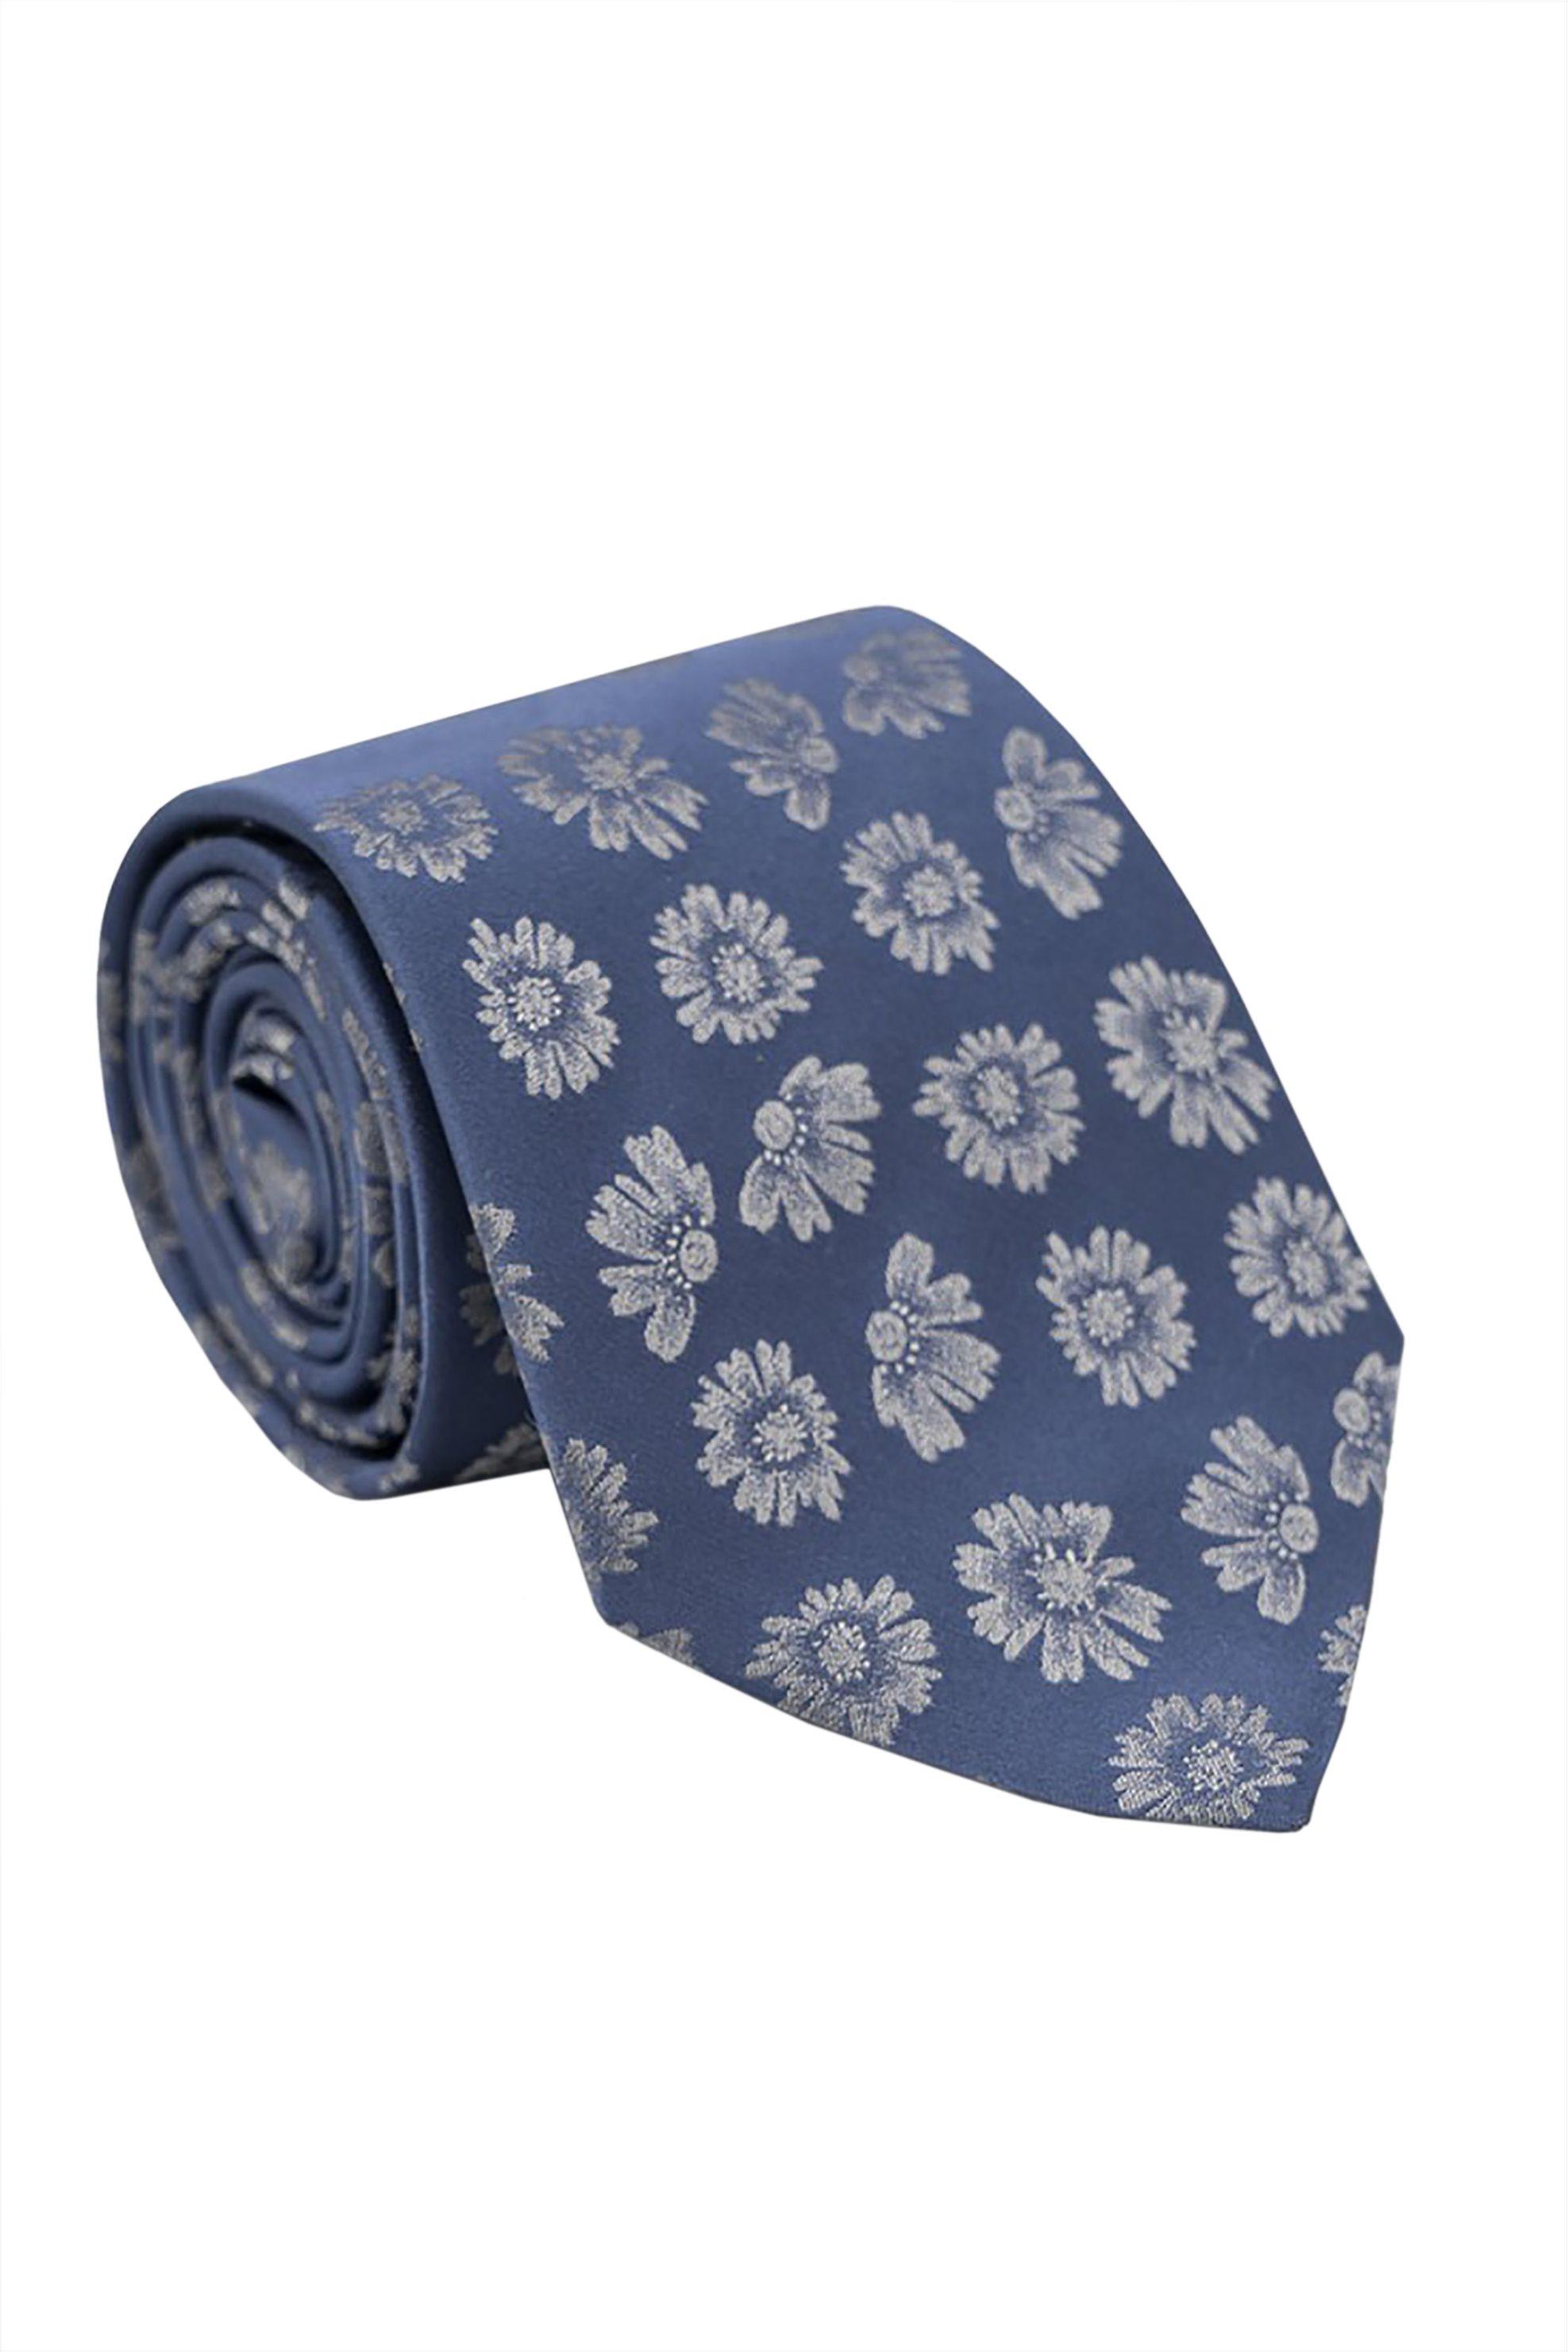 Oxford Company ανδρική μεταξωτή γραβάτα με floral print - TIE51-413.05 - Μπλε Σκούρο